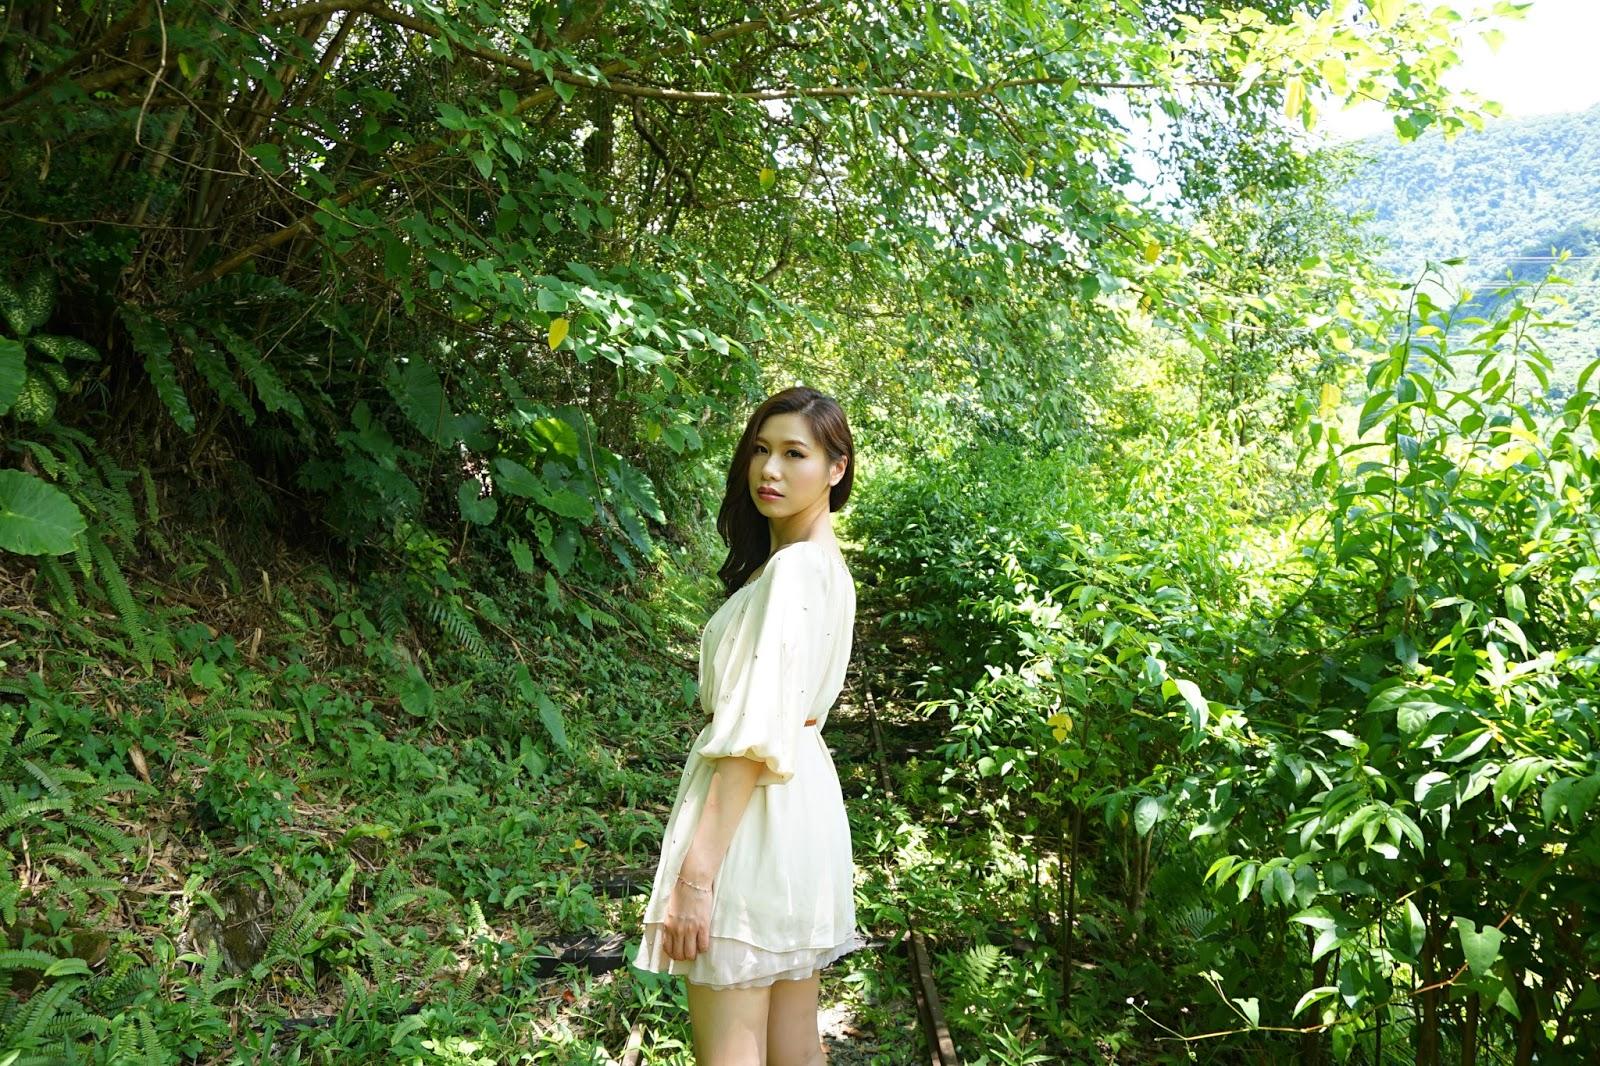 5-beautyanxiety.com-Hualien%2BTravel-Cultural%2BPark%2BForest-IMG_1432-beautyanxiety